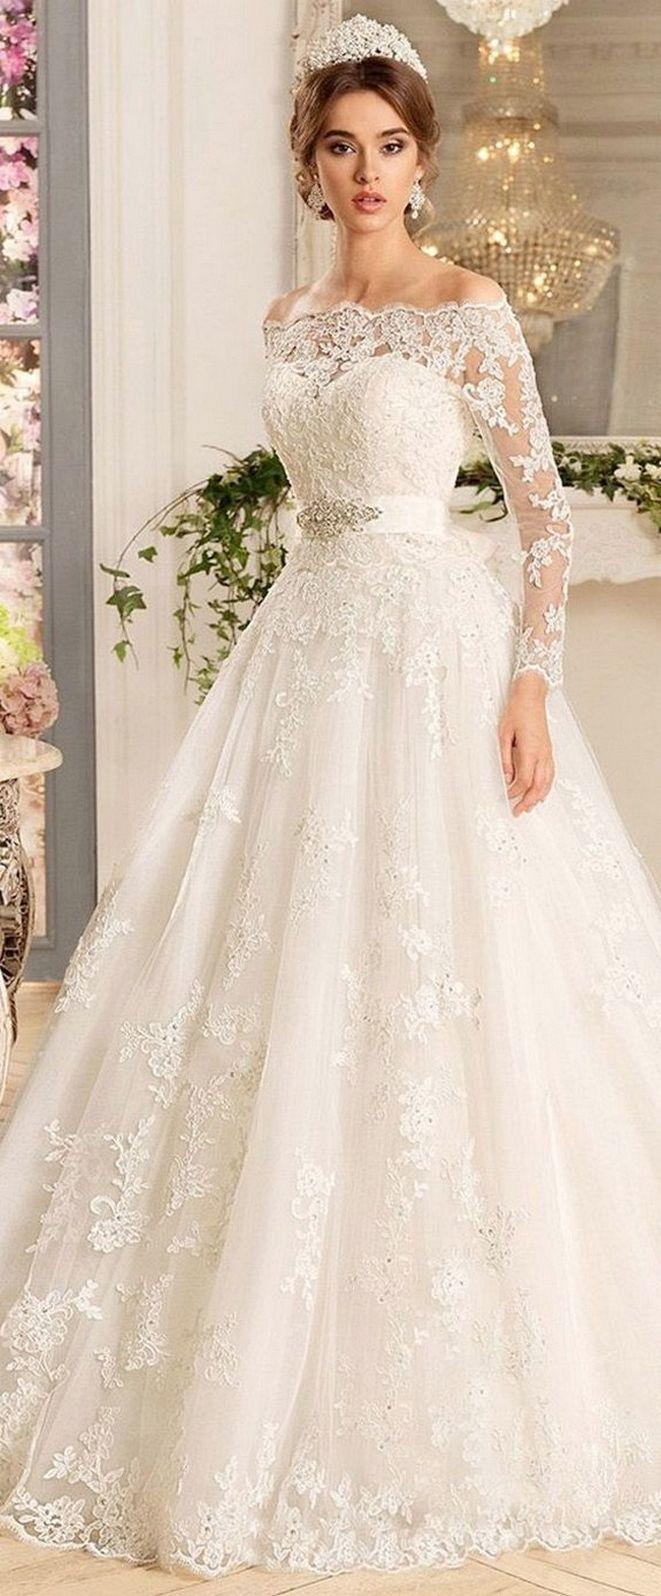 eye-catching 70+ Romantic Valentine's Day Wedding Dress Ideas https://femaline.com/2017/08/06/70-romantic-valentines-day-wedding-dress-ideas/